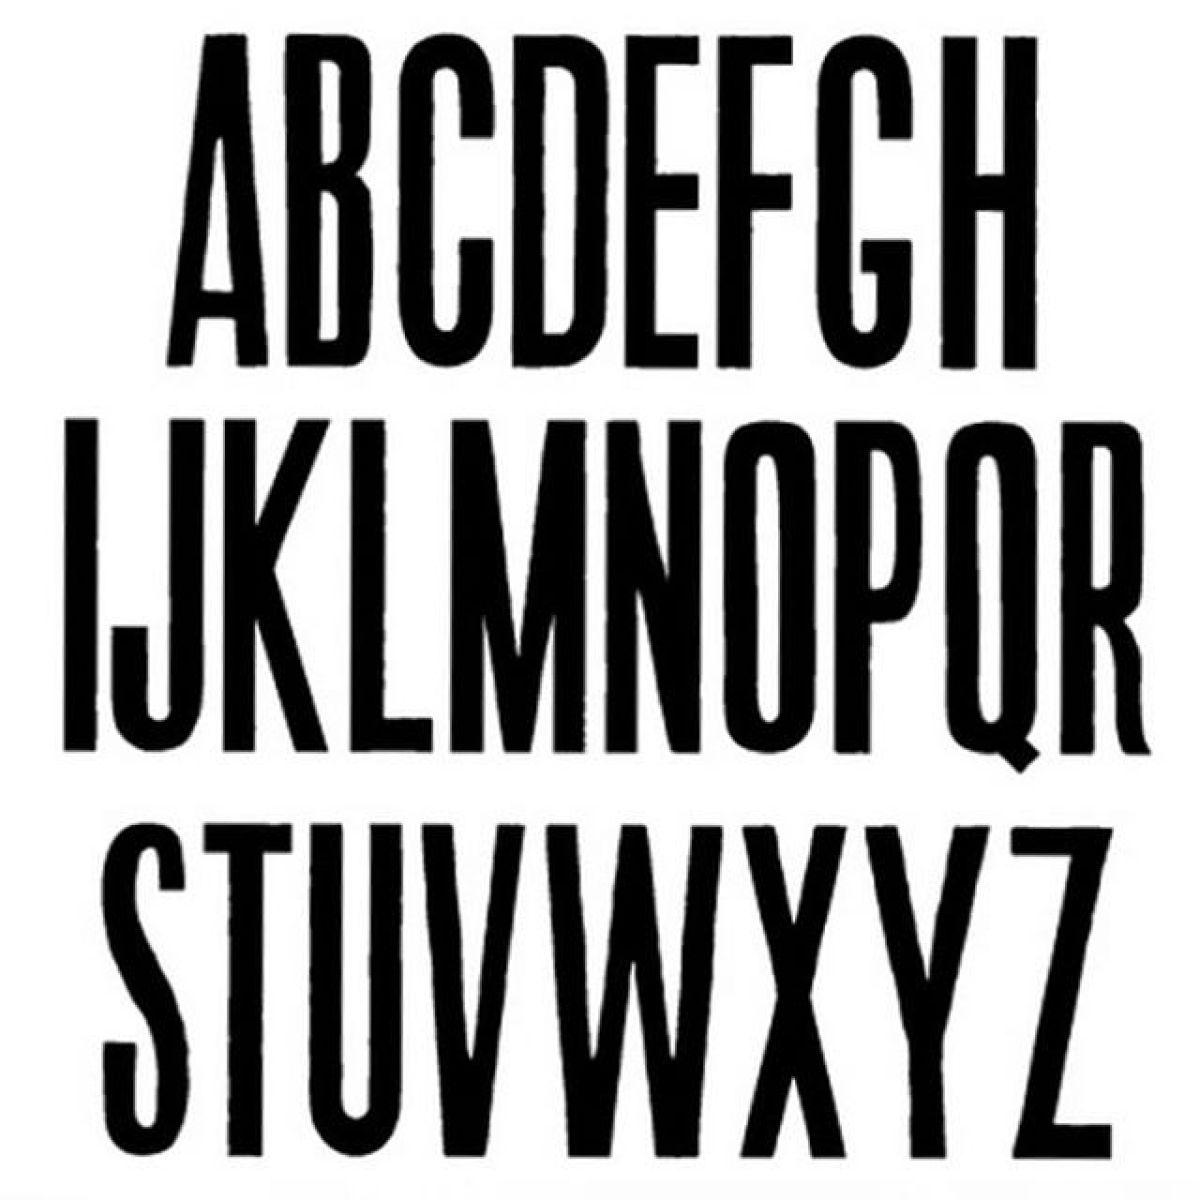 Typeface hunting — #workinprogress #wip #logo #logotype #design #graphicdesign #grafik #designer #type #typeface #typedaily #typedesign #typography #woodcuttype #lettering #letterpress